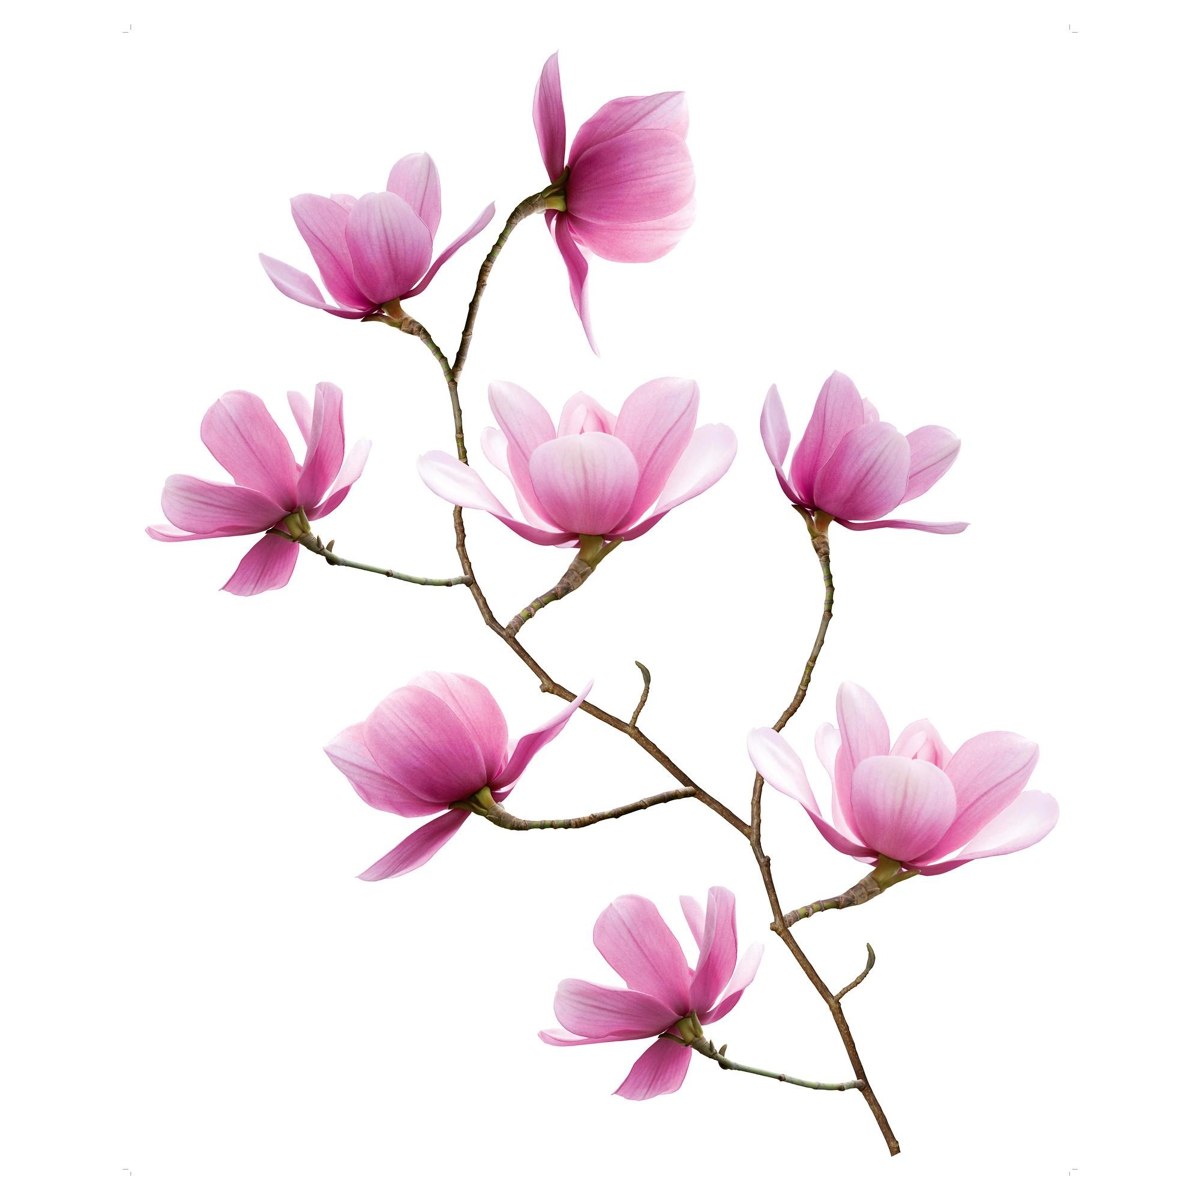 vinilos decorativos de Ikea - mod. Slätthult magnolia